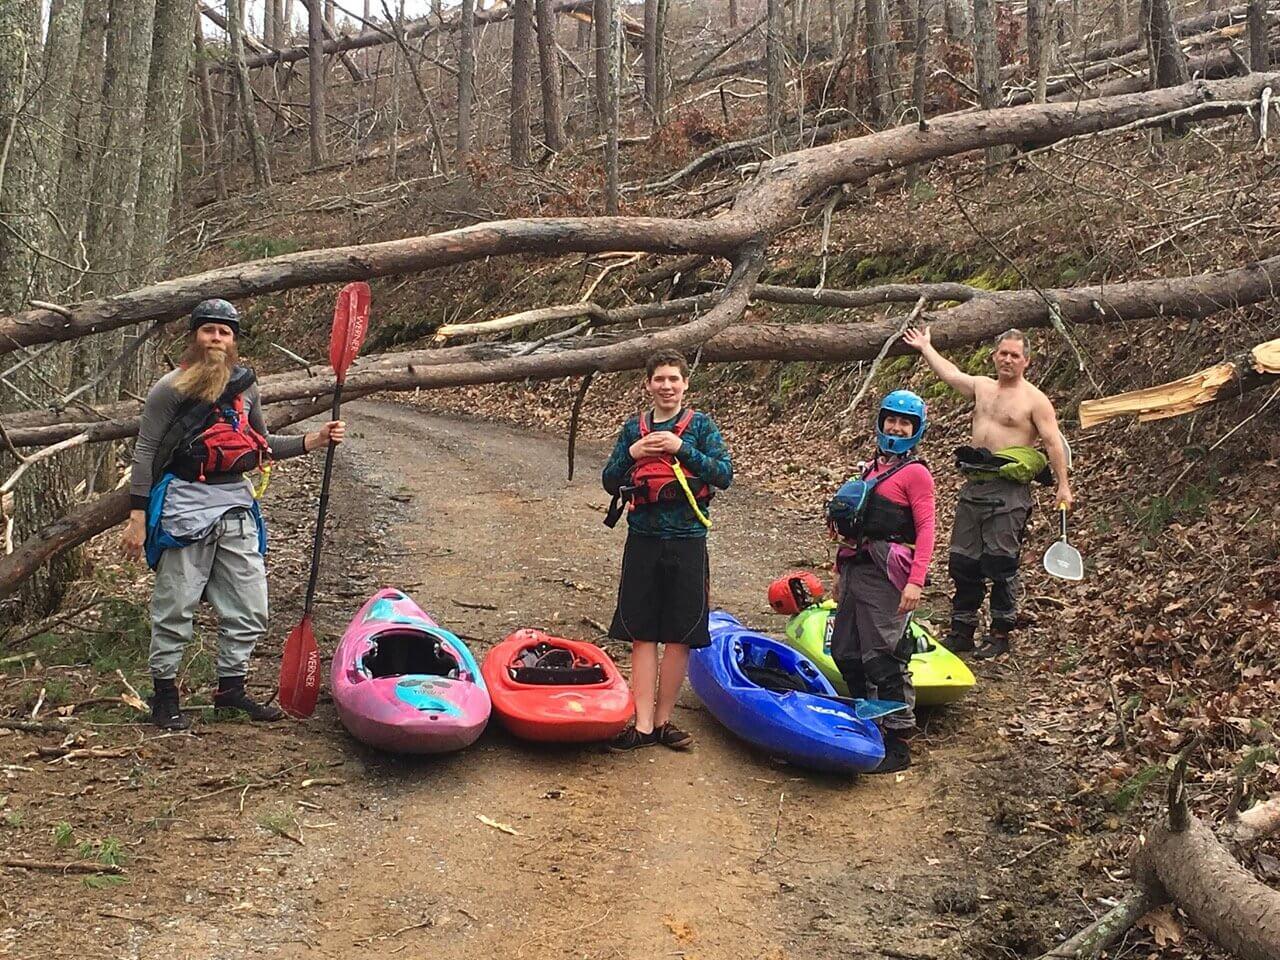 Spring Paddling brings Wood Tribulations